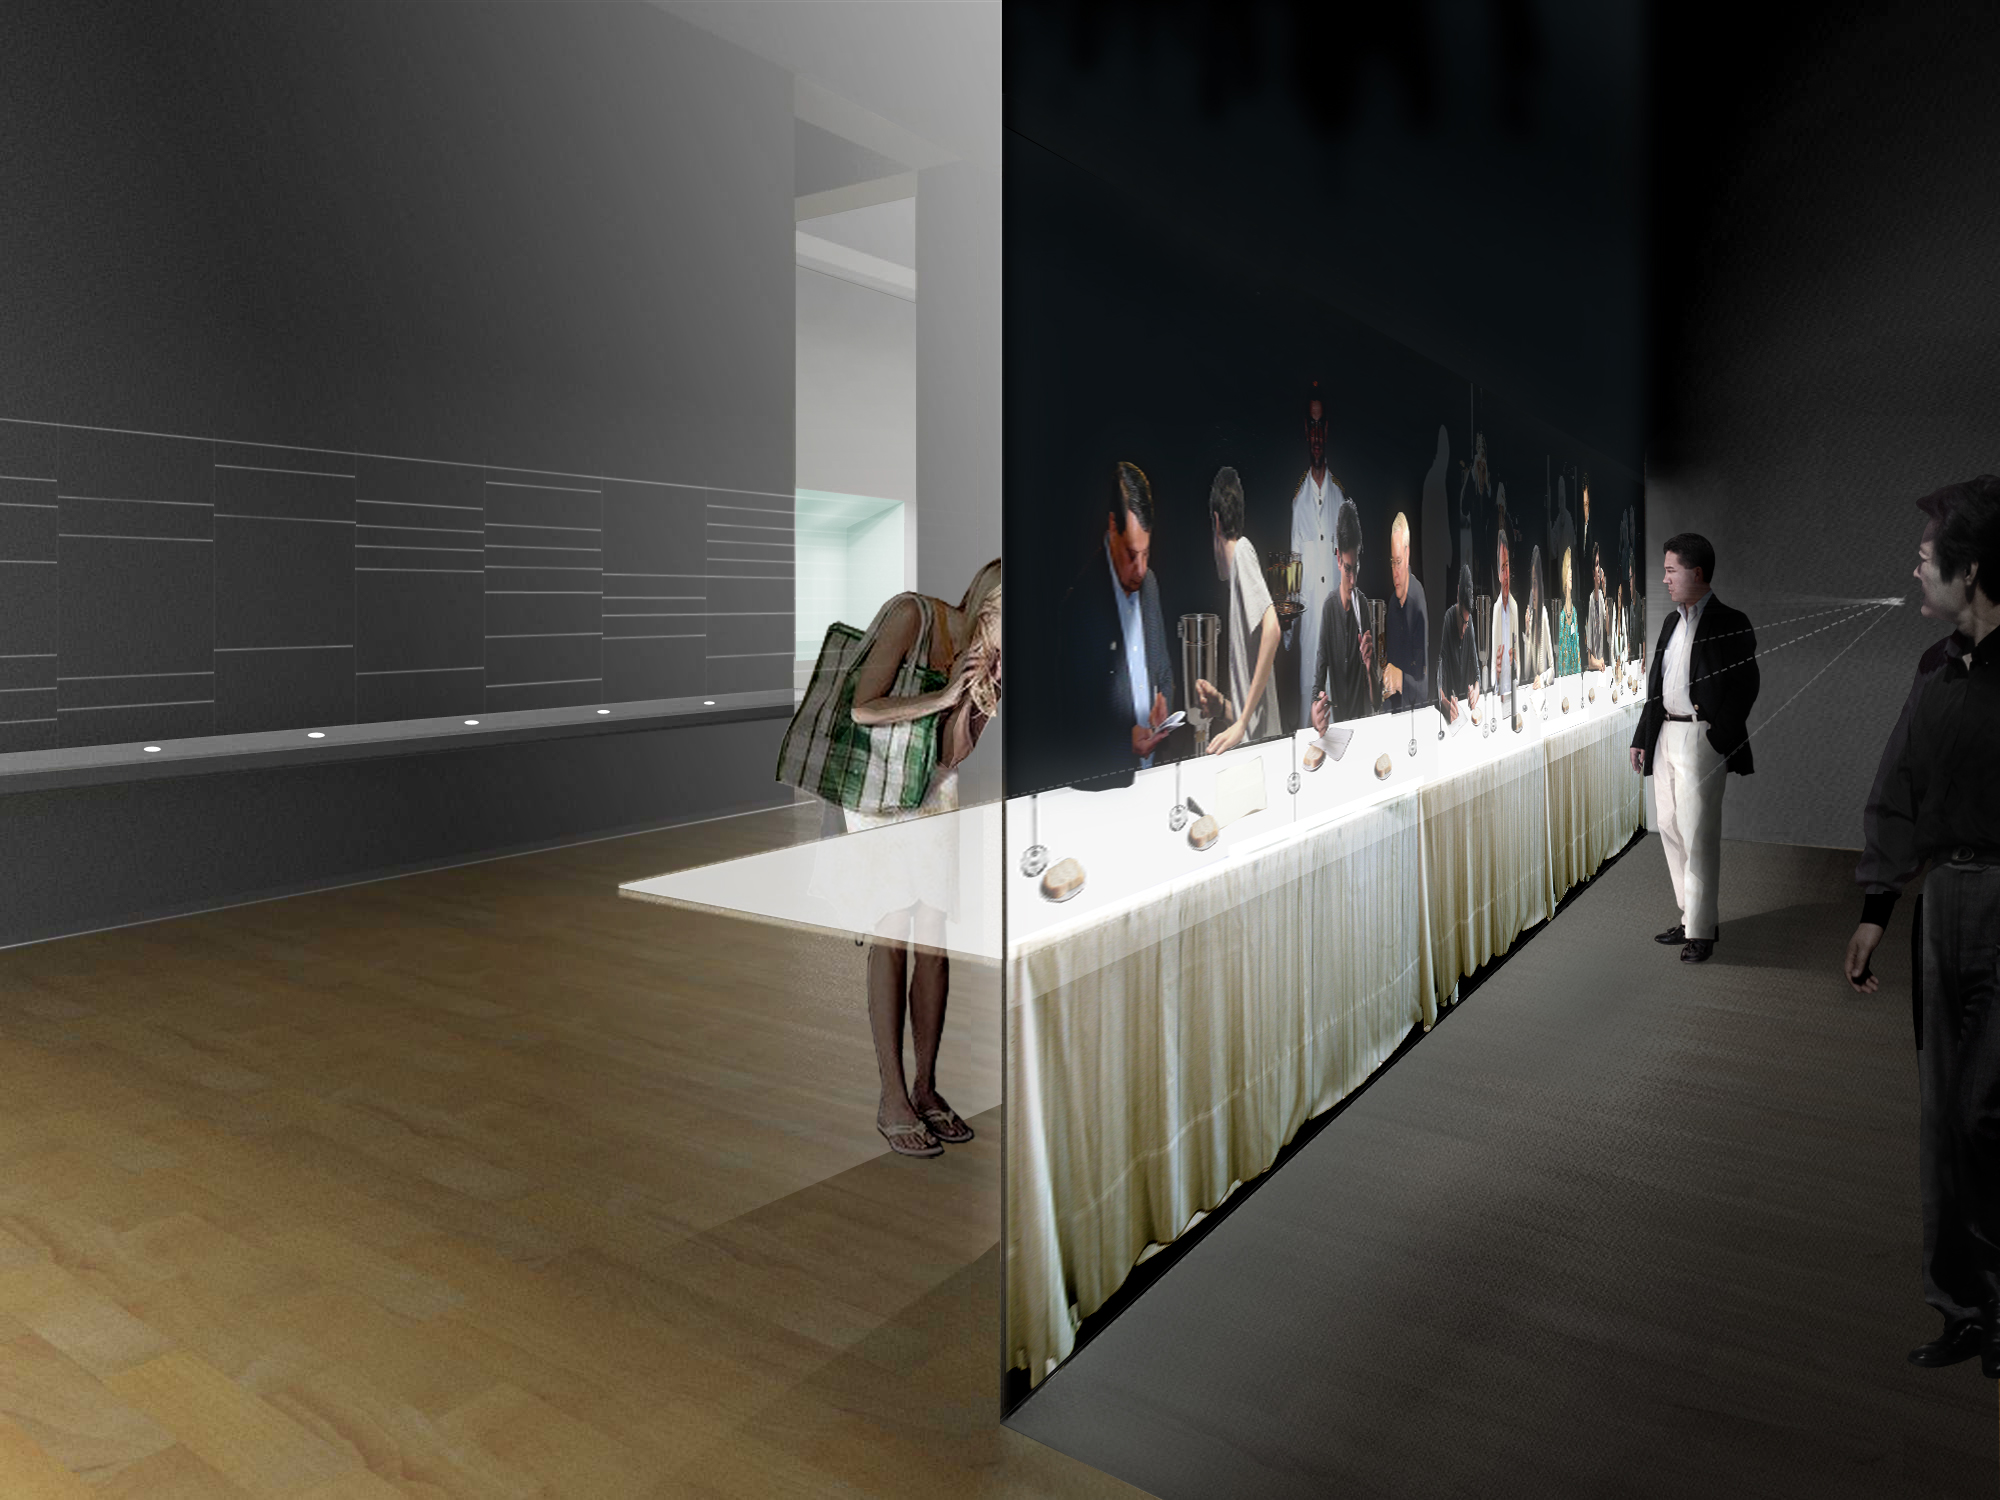 09_1202-Table Corner-02.jpg